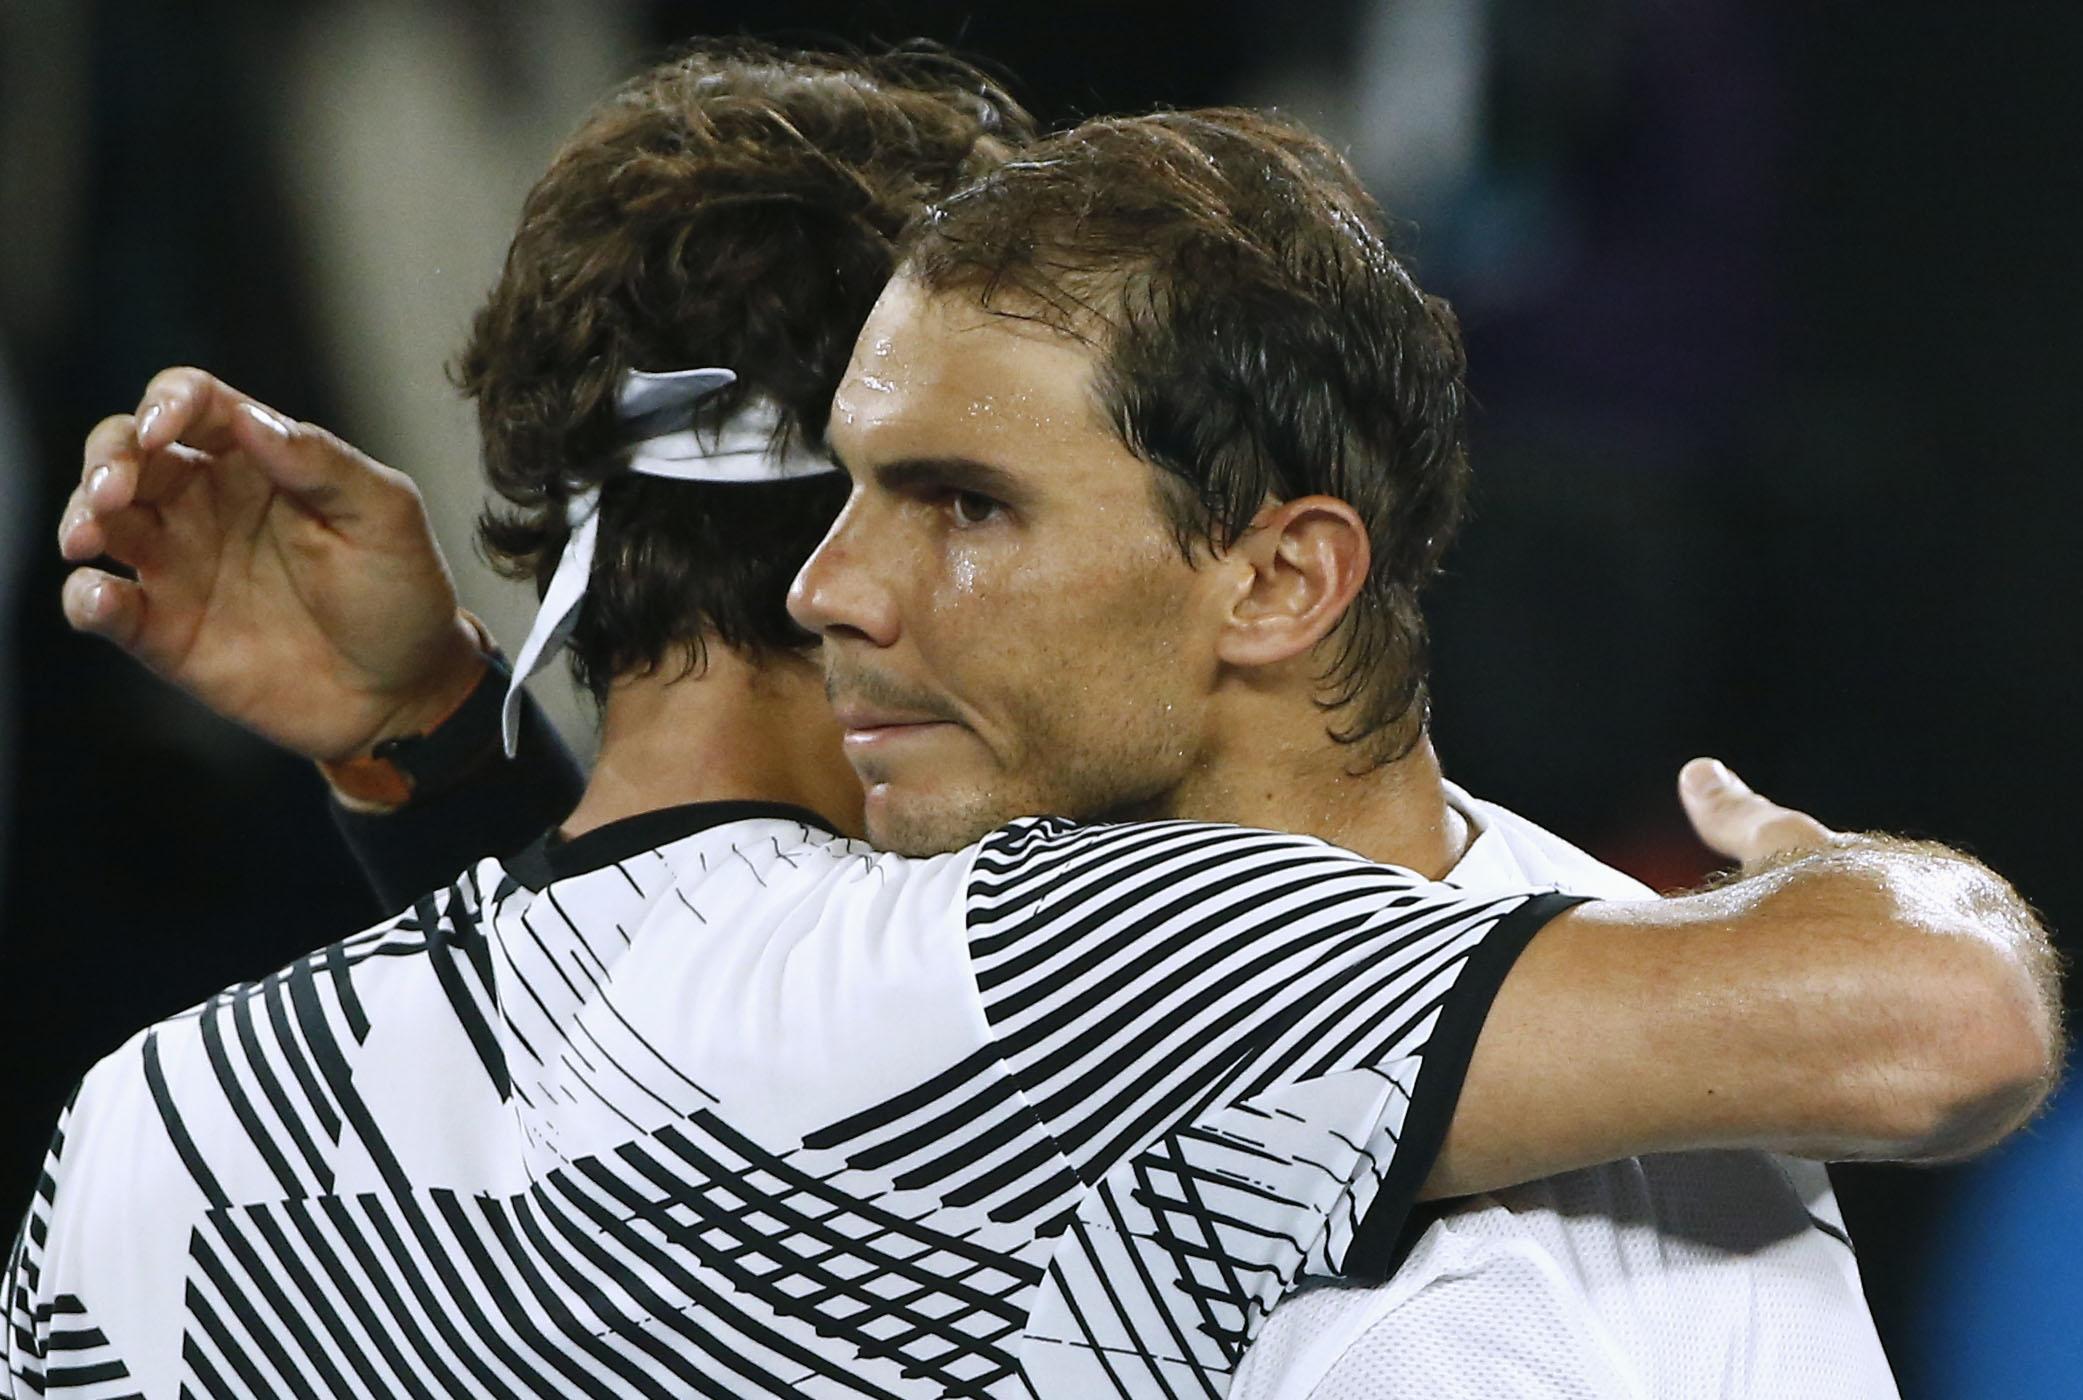 Tennis - Australian Open - Melbourne Park, Melbourne, Australia - 29/1/17 Switzerland's Roger Federer embraces after winning his Men's singles final match against Spain's Rafael Nadal. REUTERS/Thomas Peter